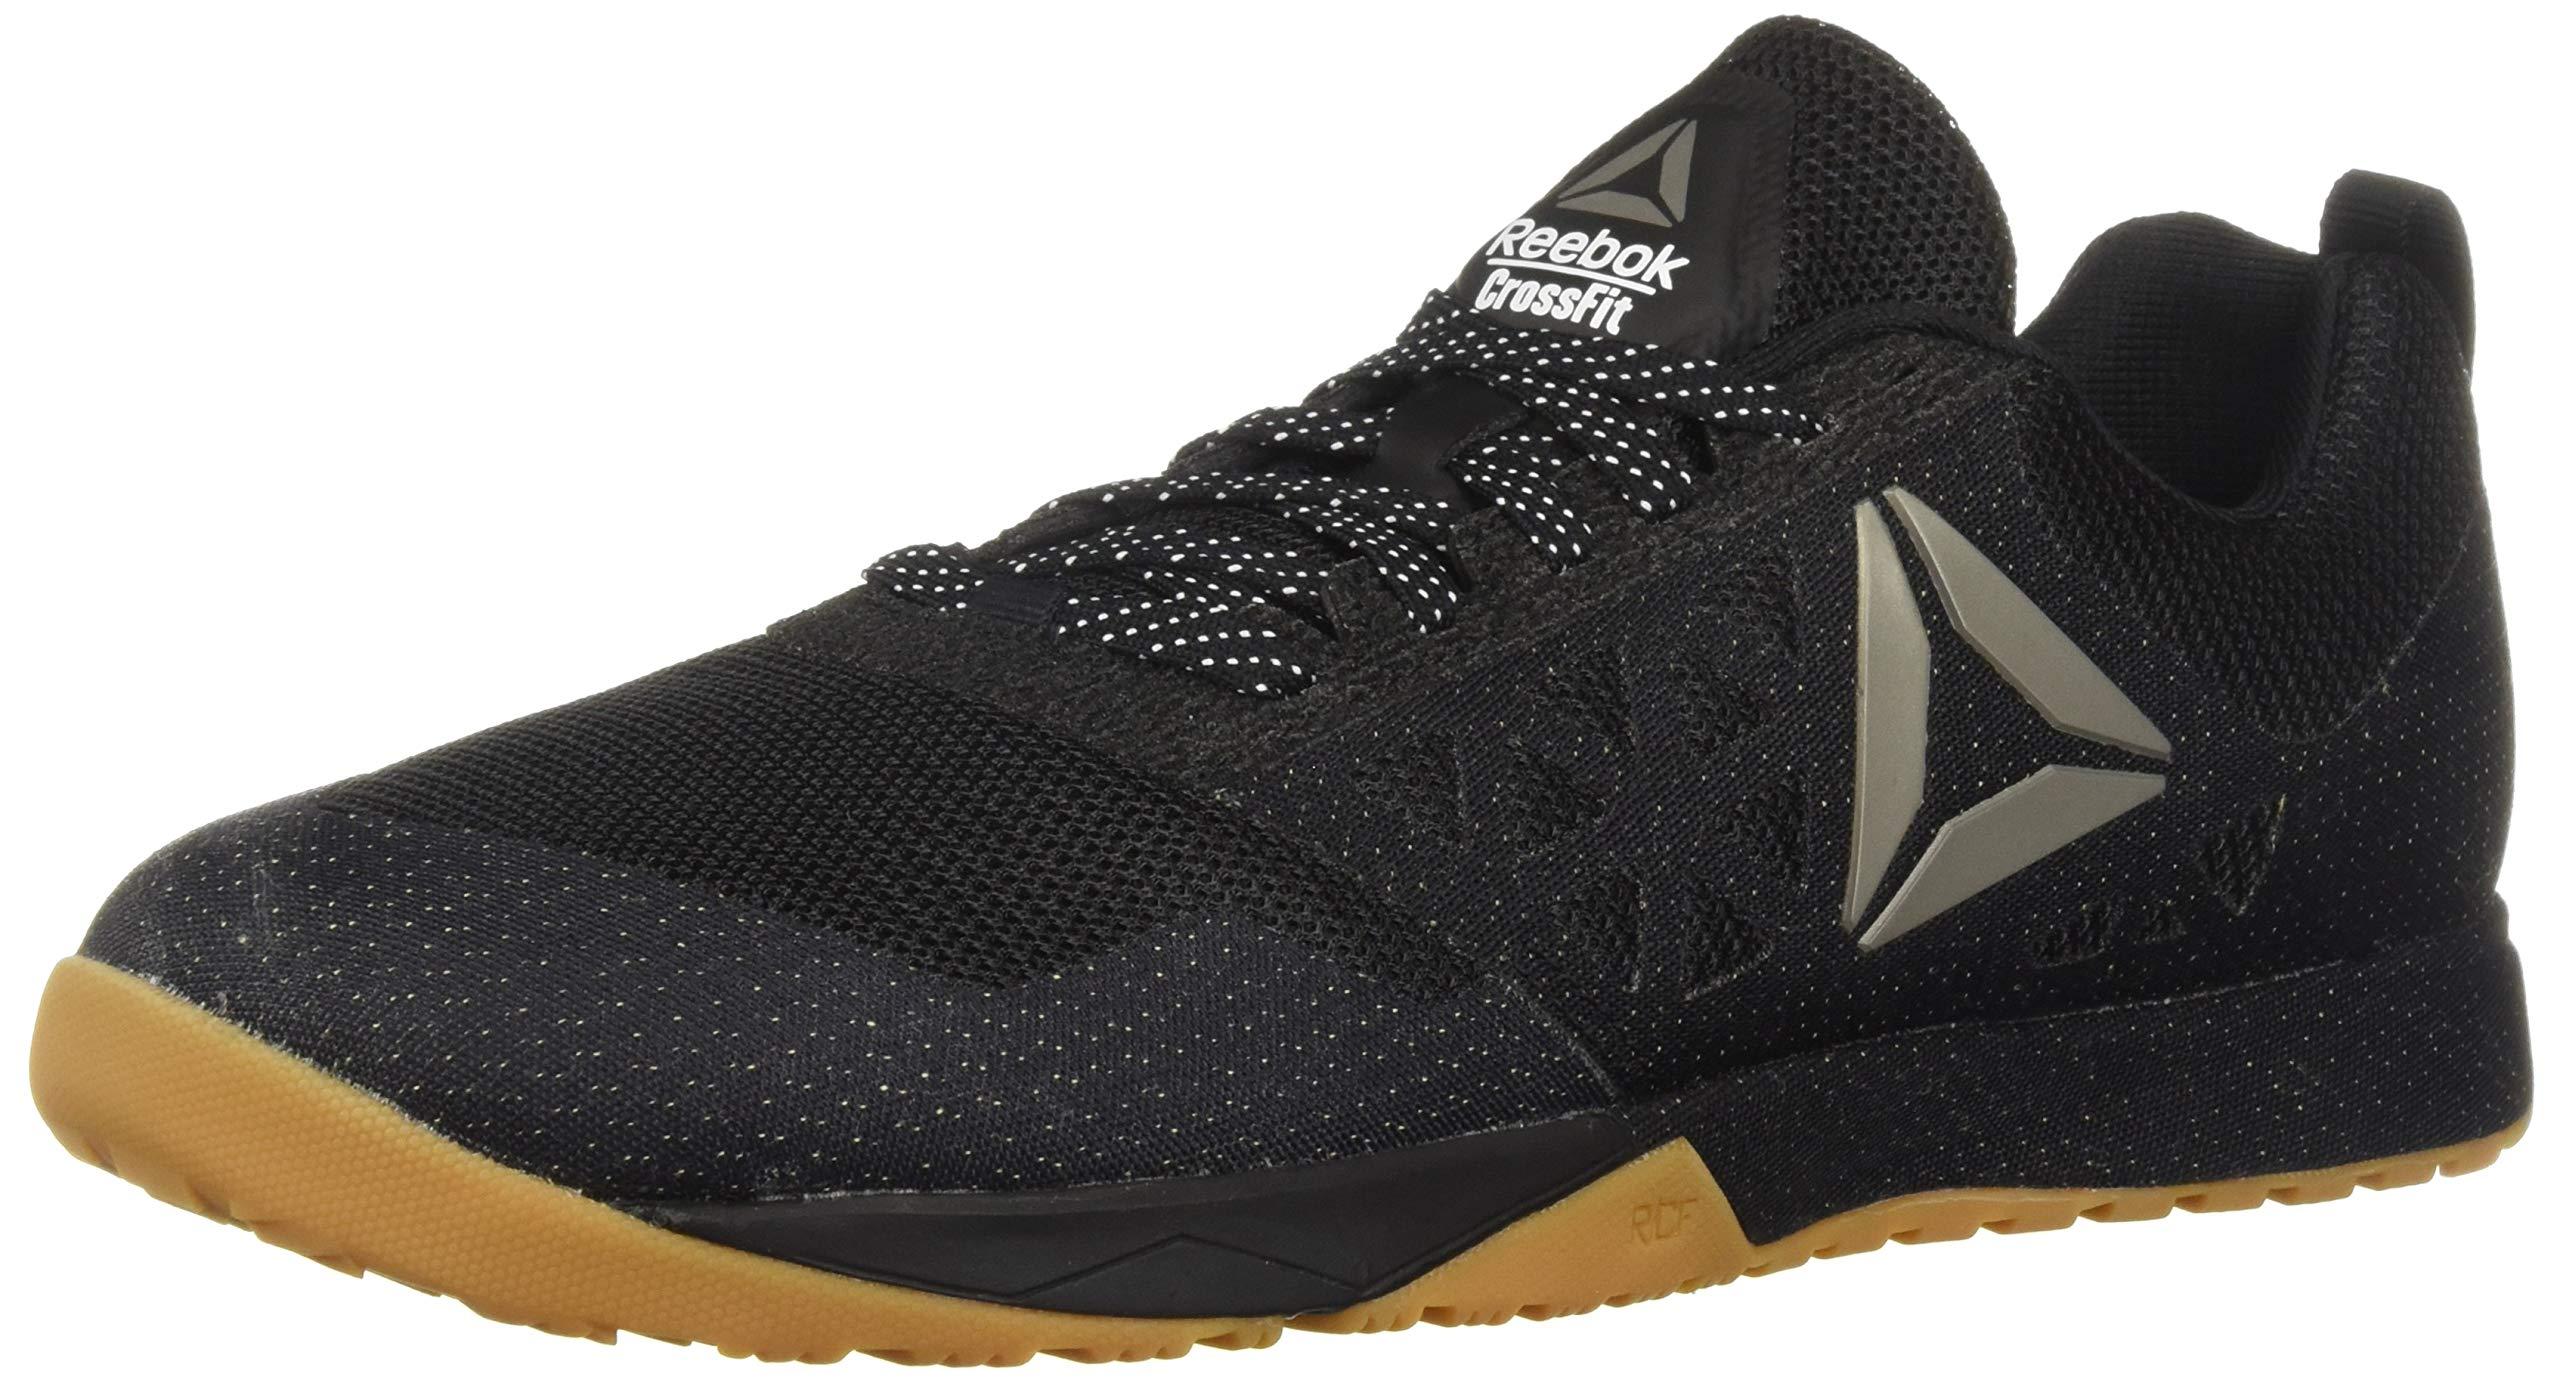 Reebok Men's CROSSFIT Nano 6.0 Climbing Shoe, Black/Gum, 10.5 M US